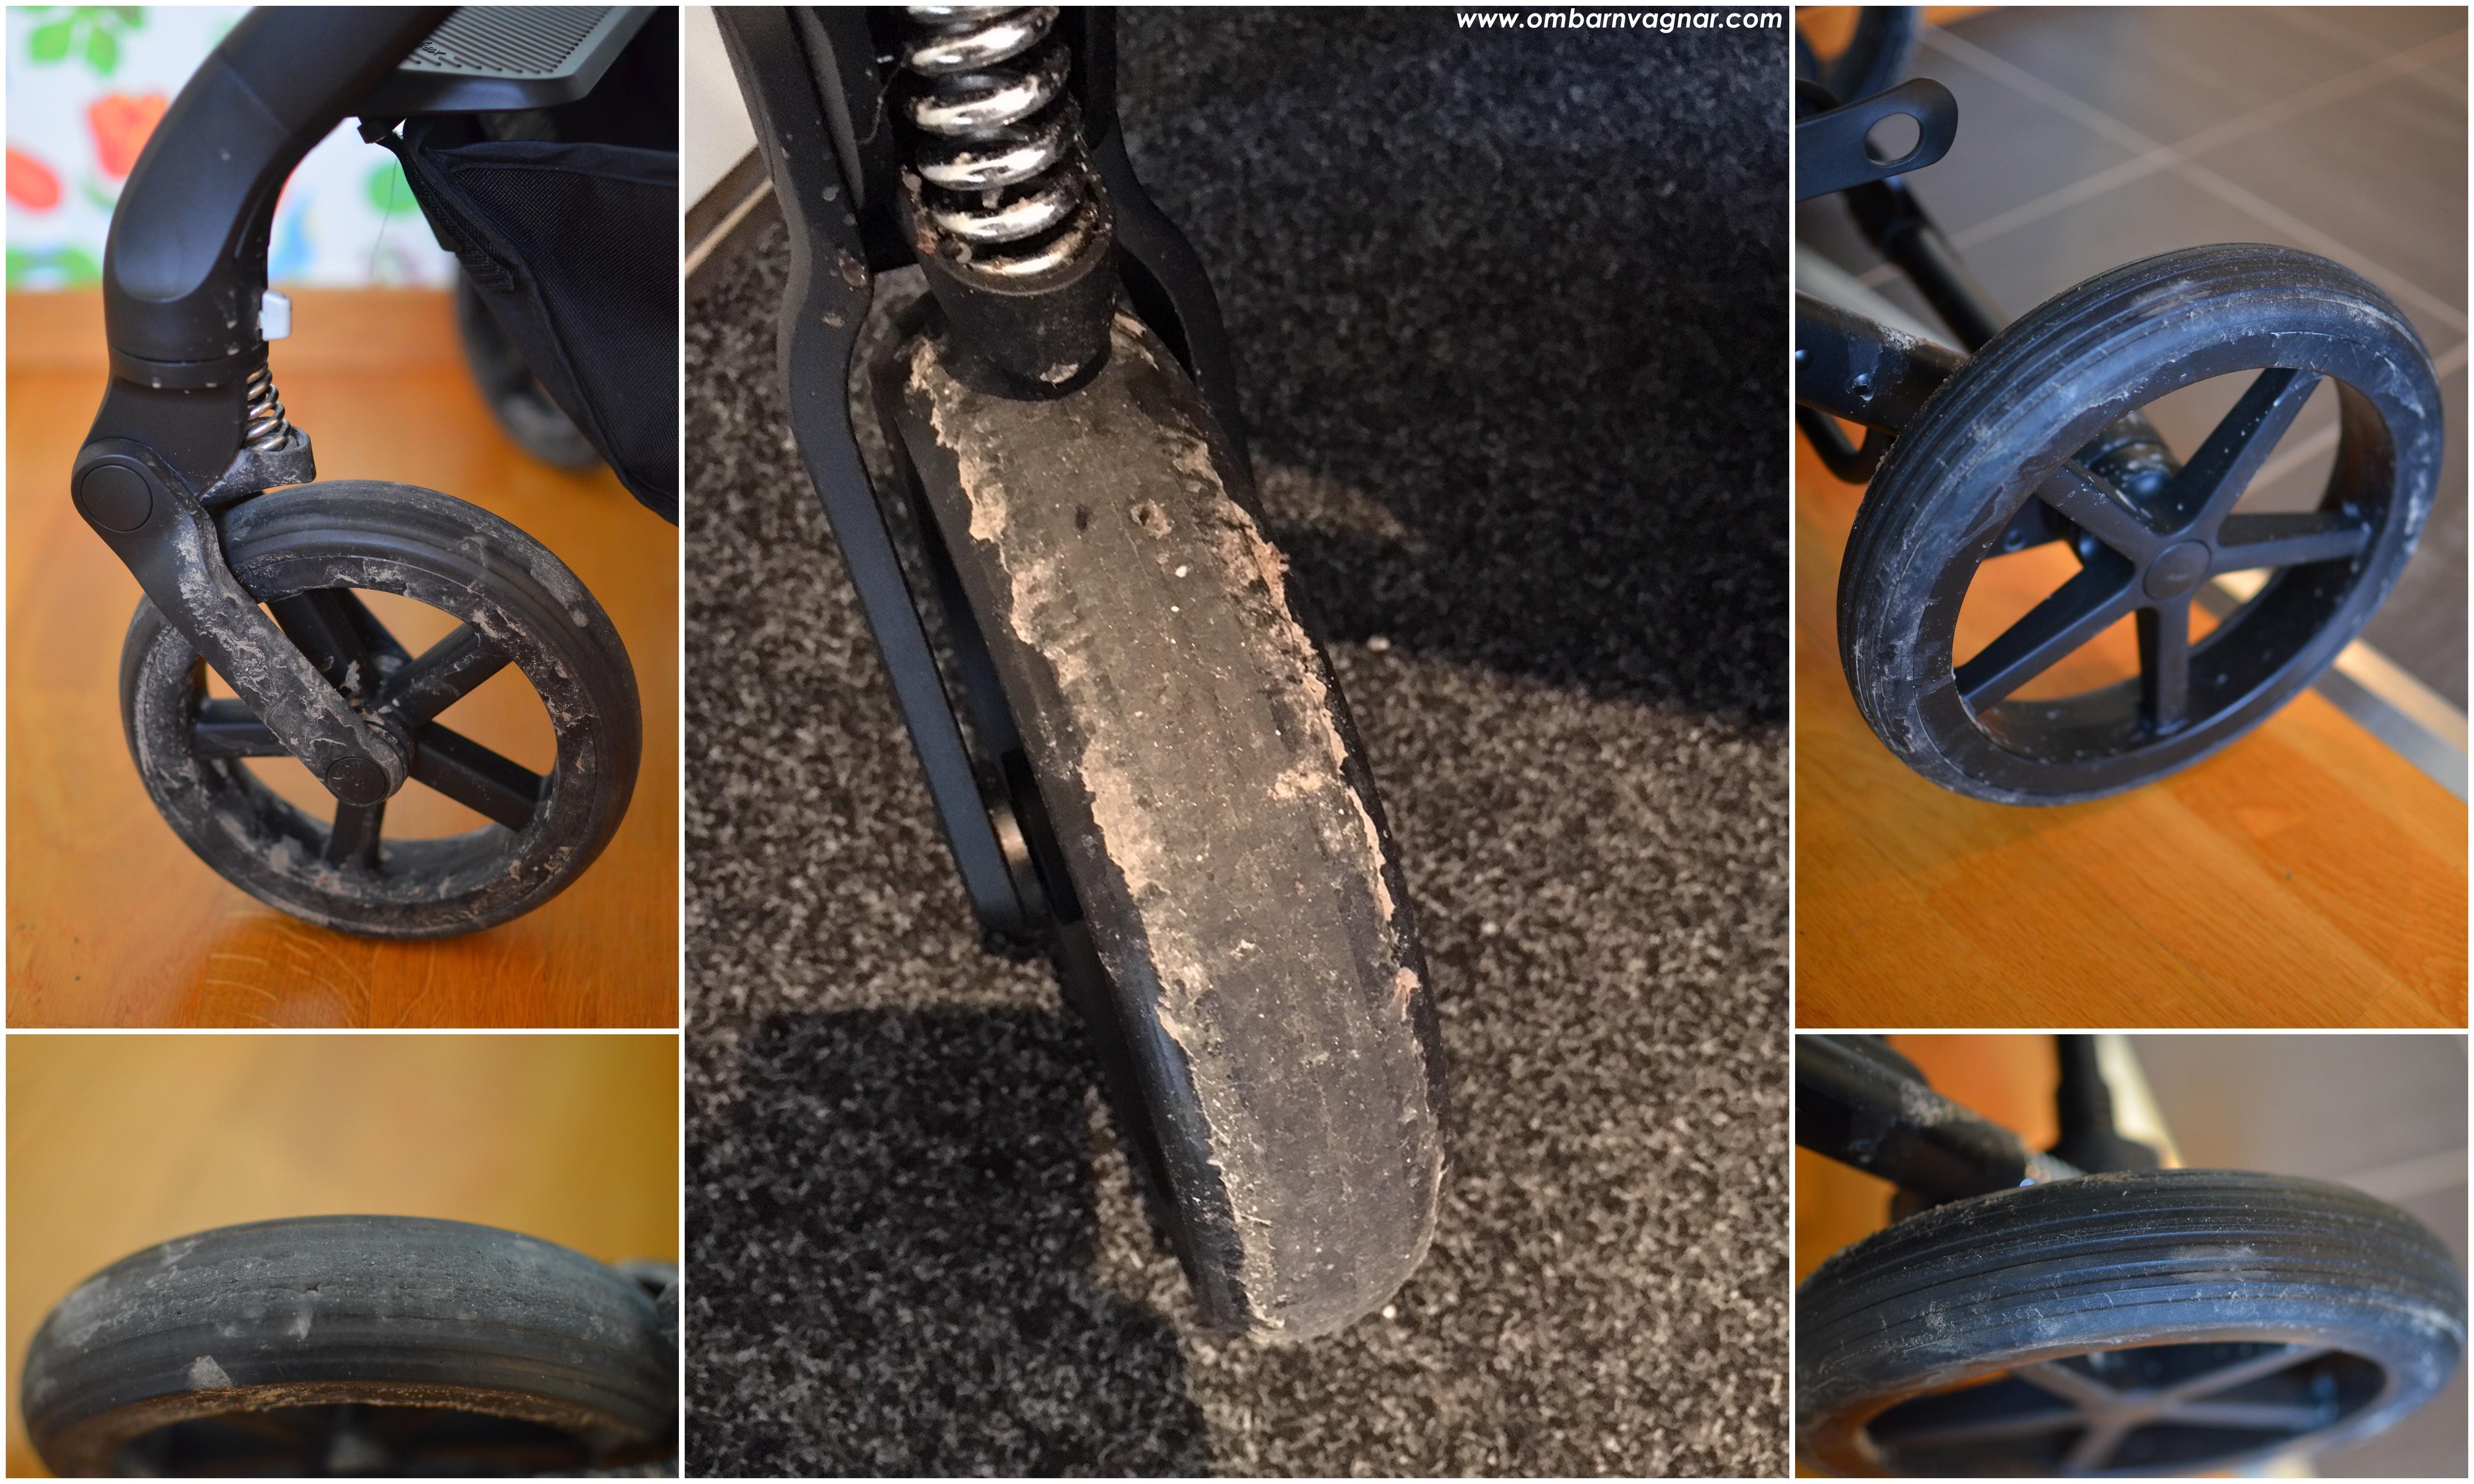 Cybex Balios S punkteringsfria däck